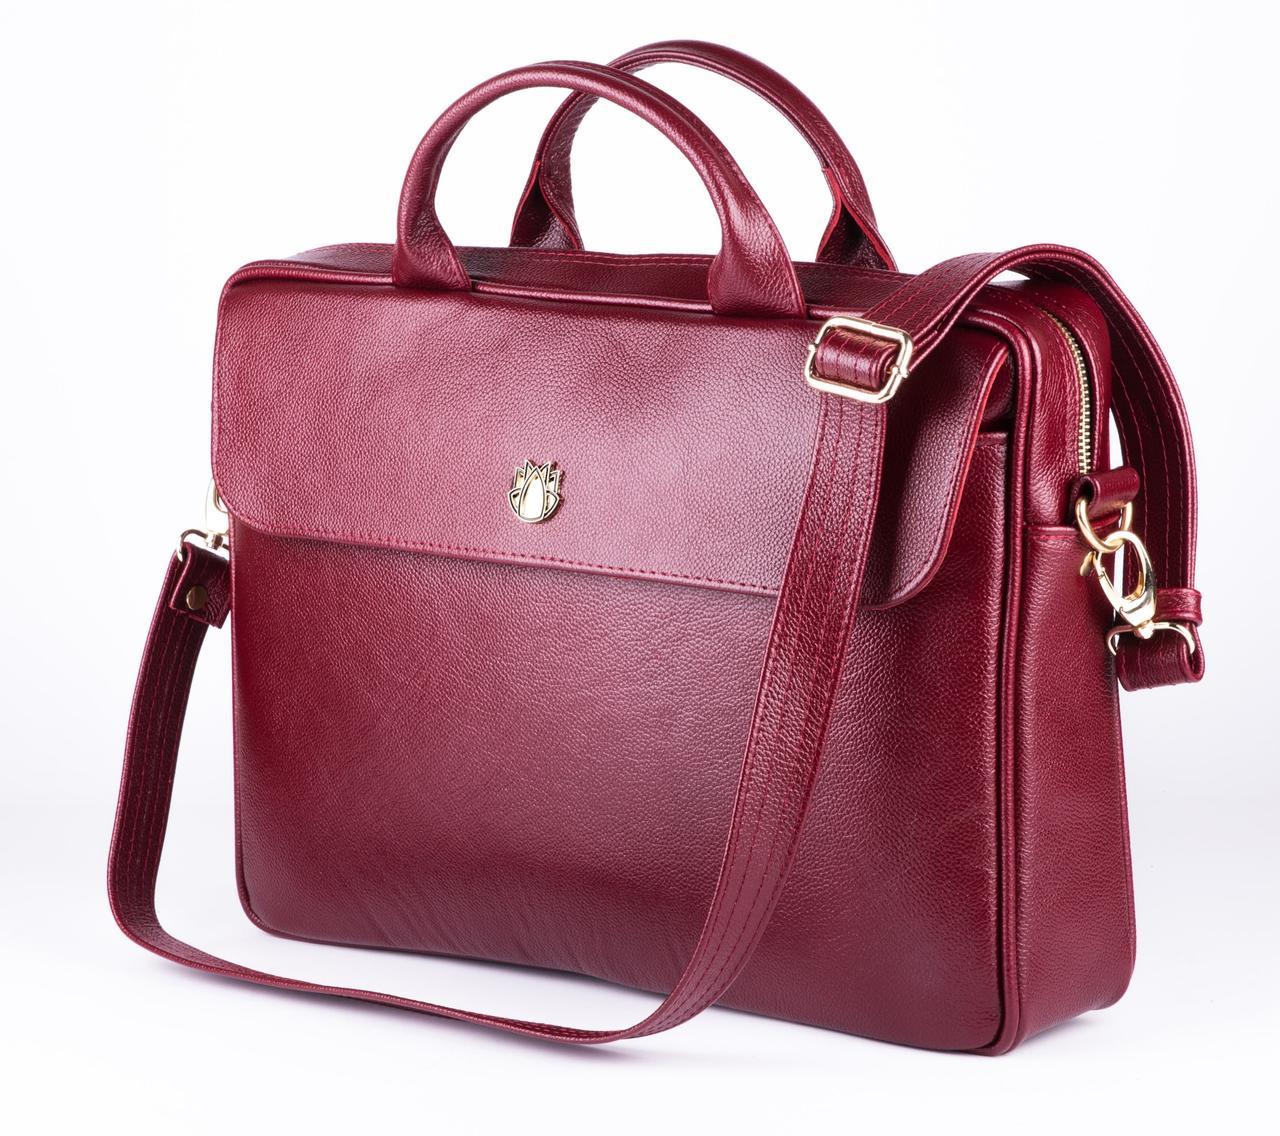 "Элегантная кожаная женская сумка для ноутбука Felice 15 - 15,6"" Красная (FL16Red)"